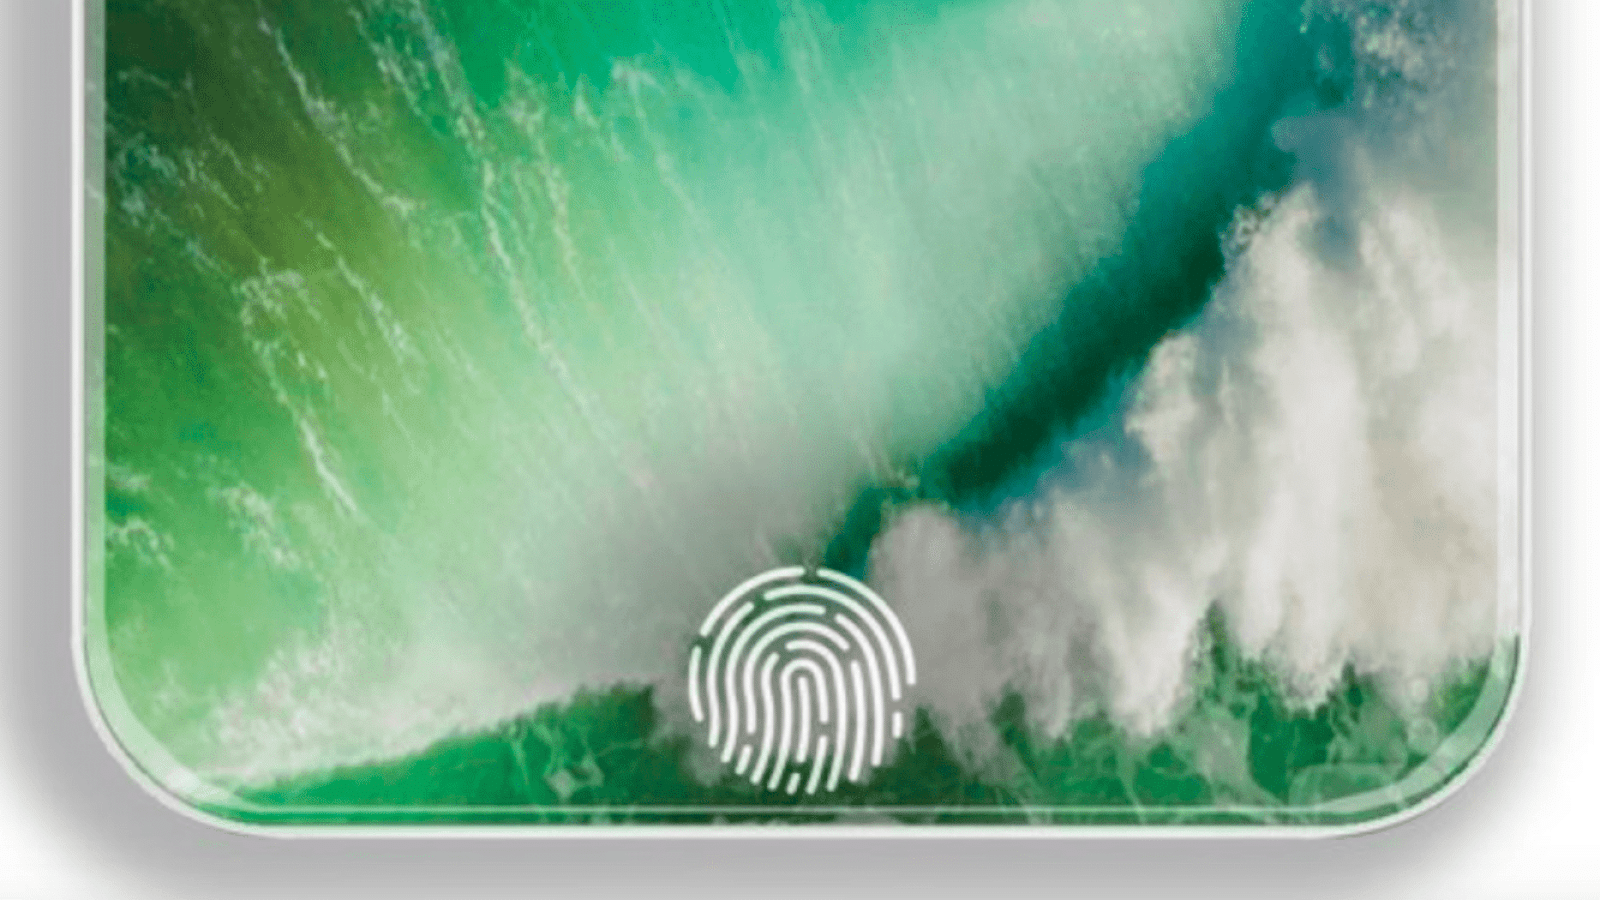 apple iphone in-screen touchscreen